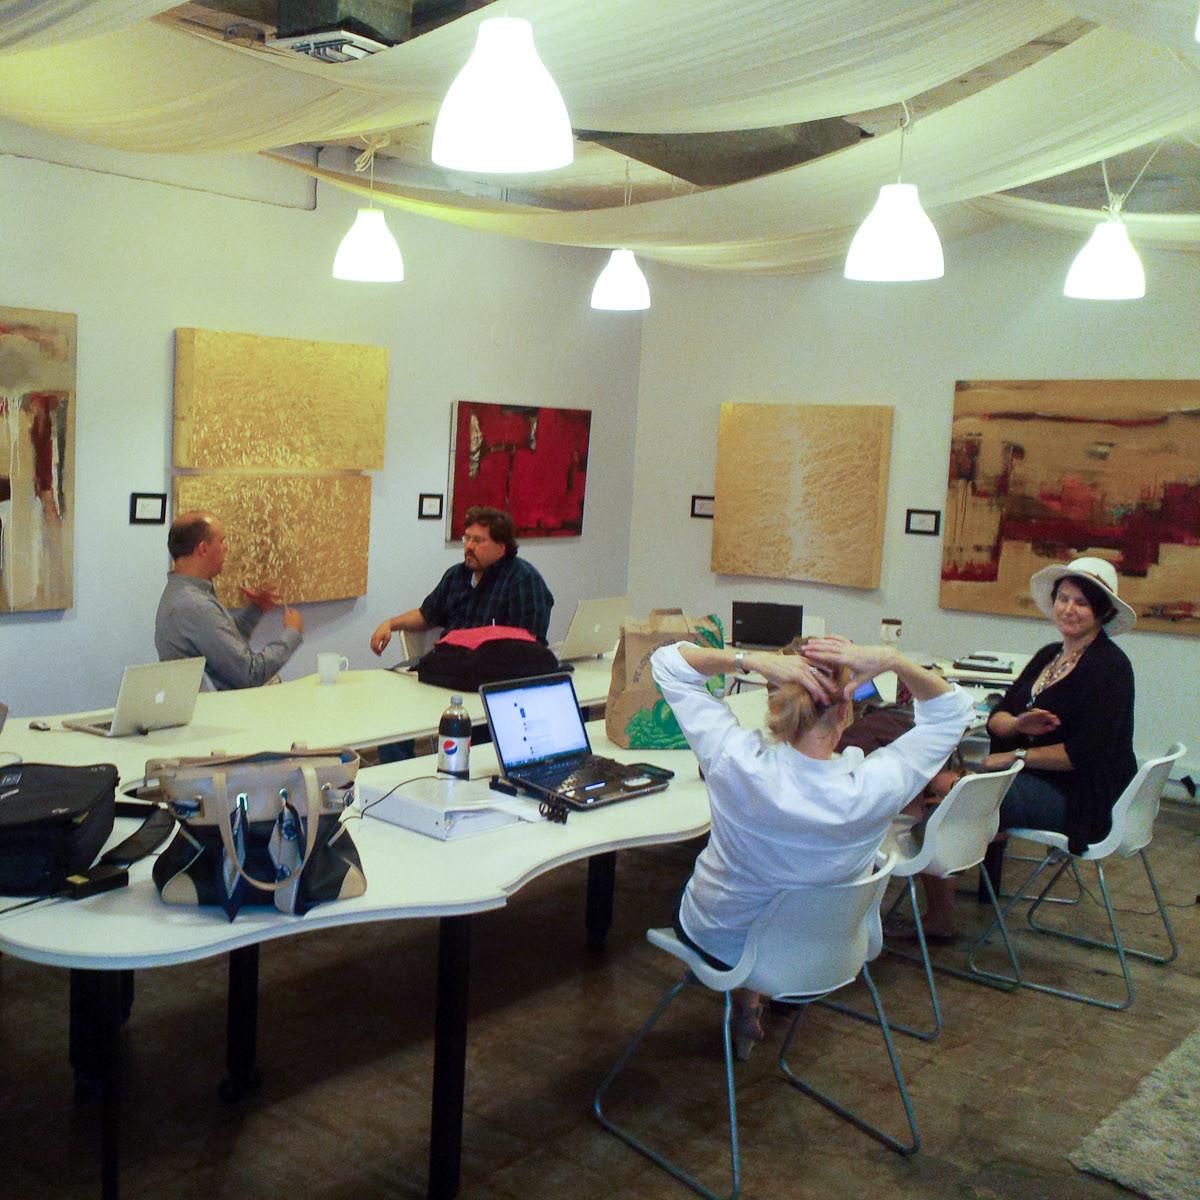 News_Tyler Rudick_Caroline Collective_co-working_common room_co-working in June